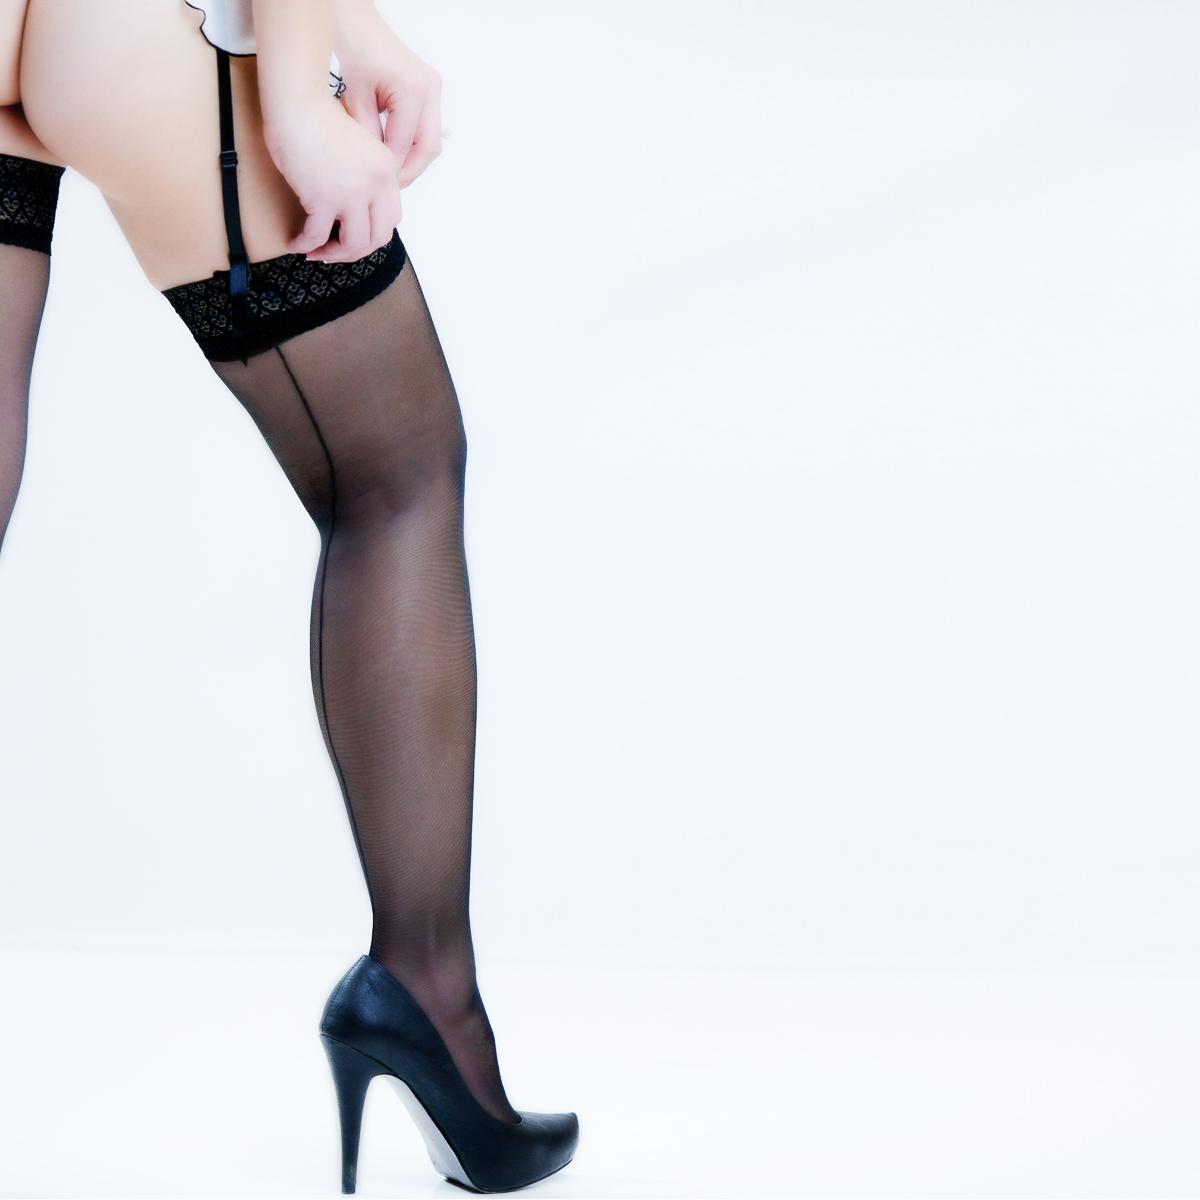 julia-juliati-bridal-boudoir-photography-westchester-ny-sexy-heels